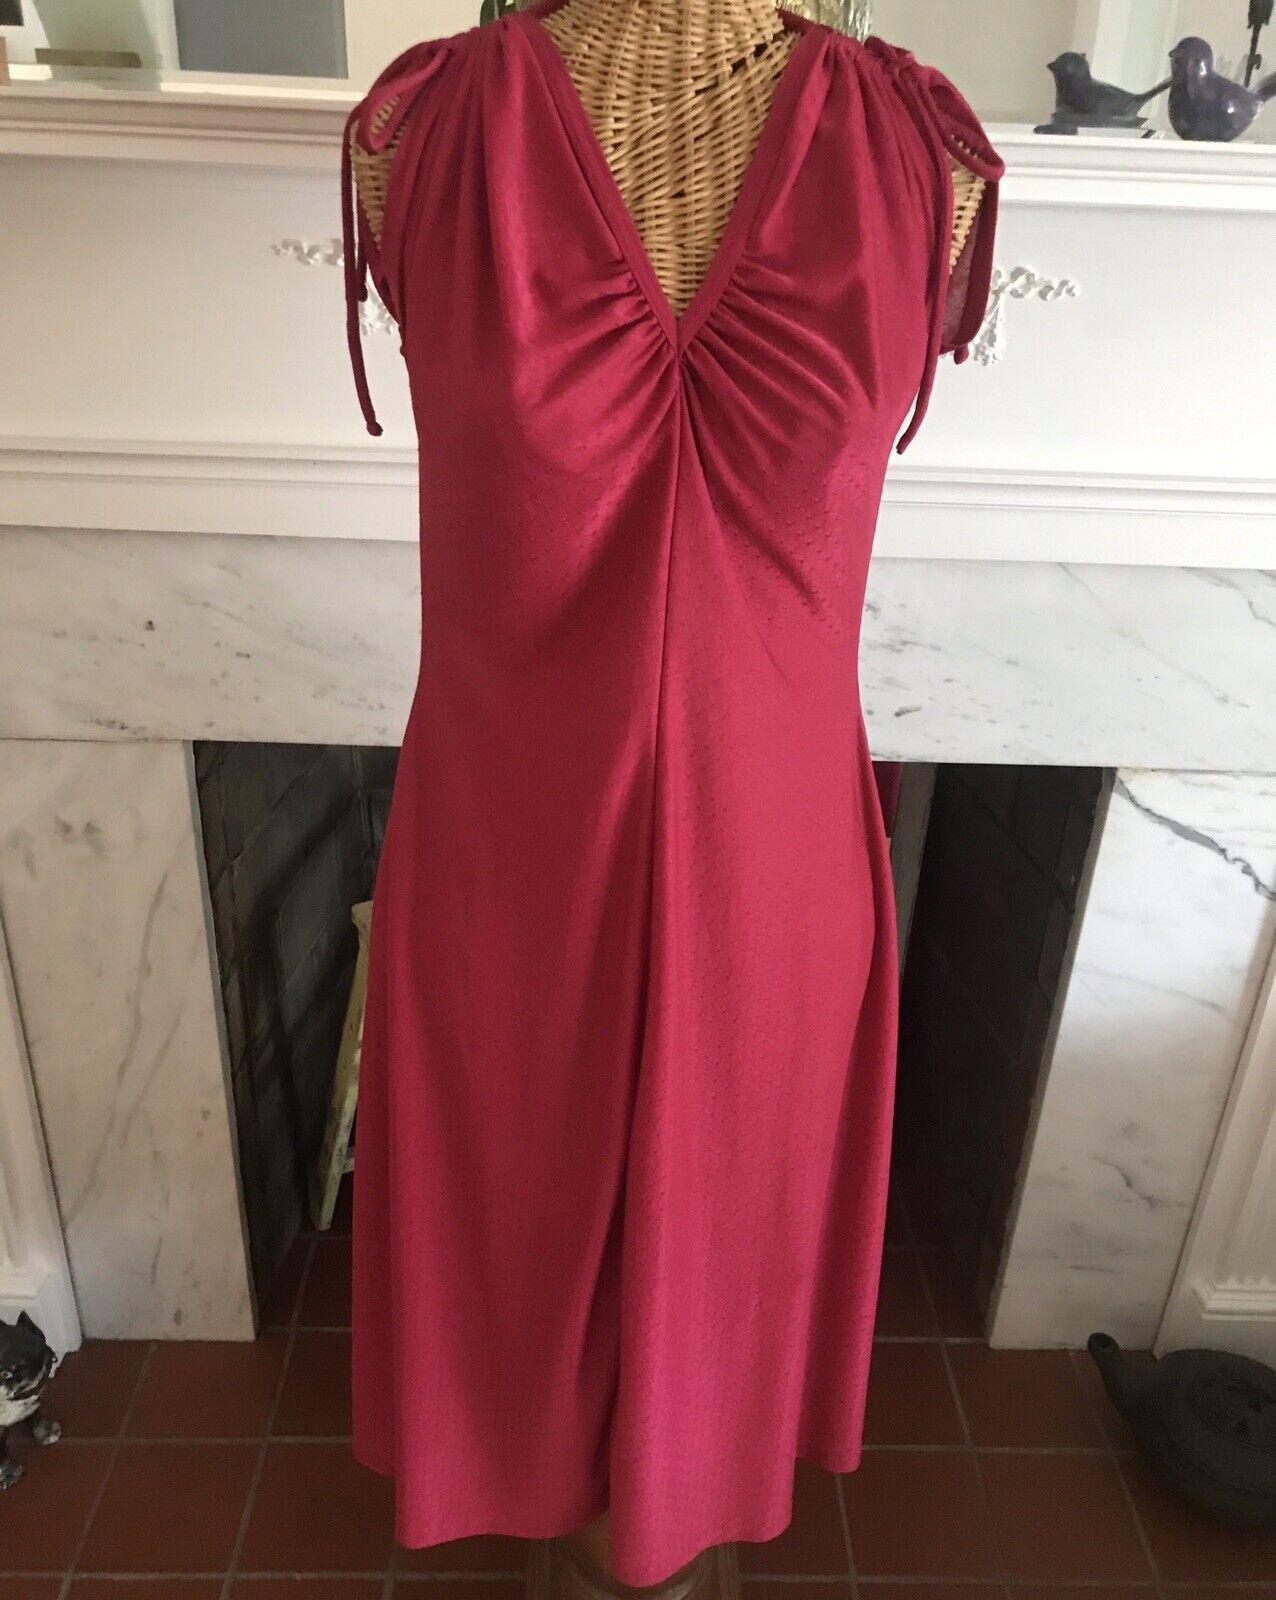 Tie belt. v neck with ruffles on bottom Sweet vintage 70-80s purple dress Sleeveless